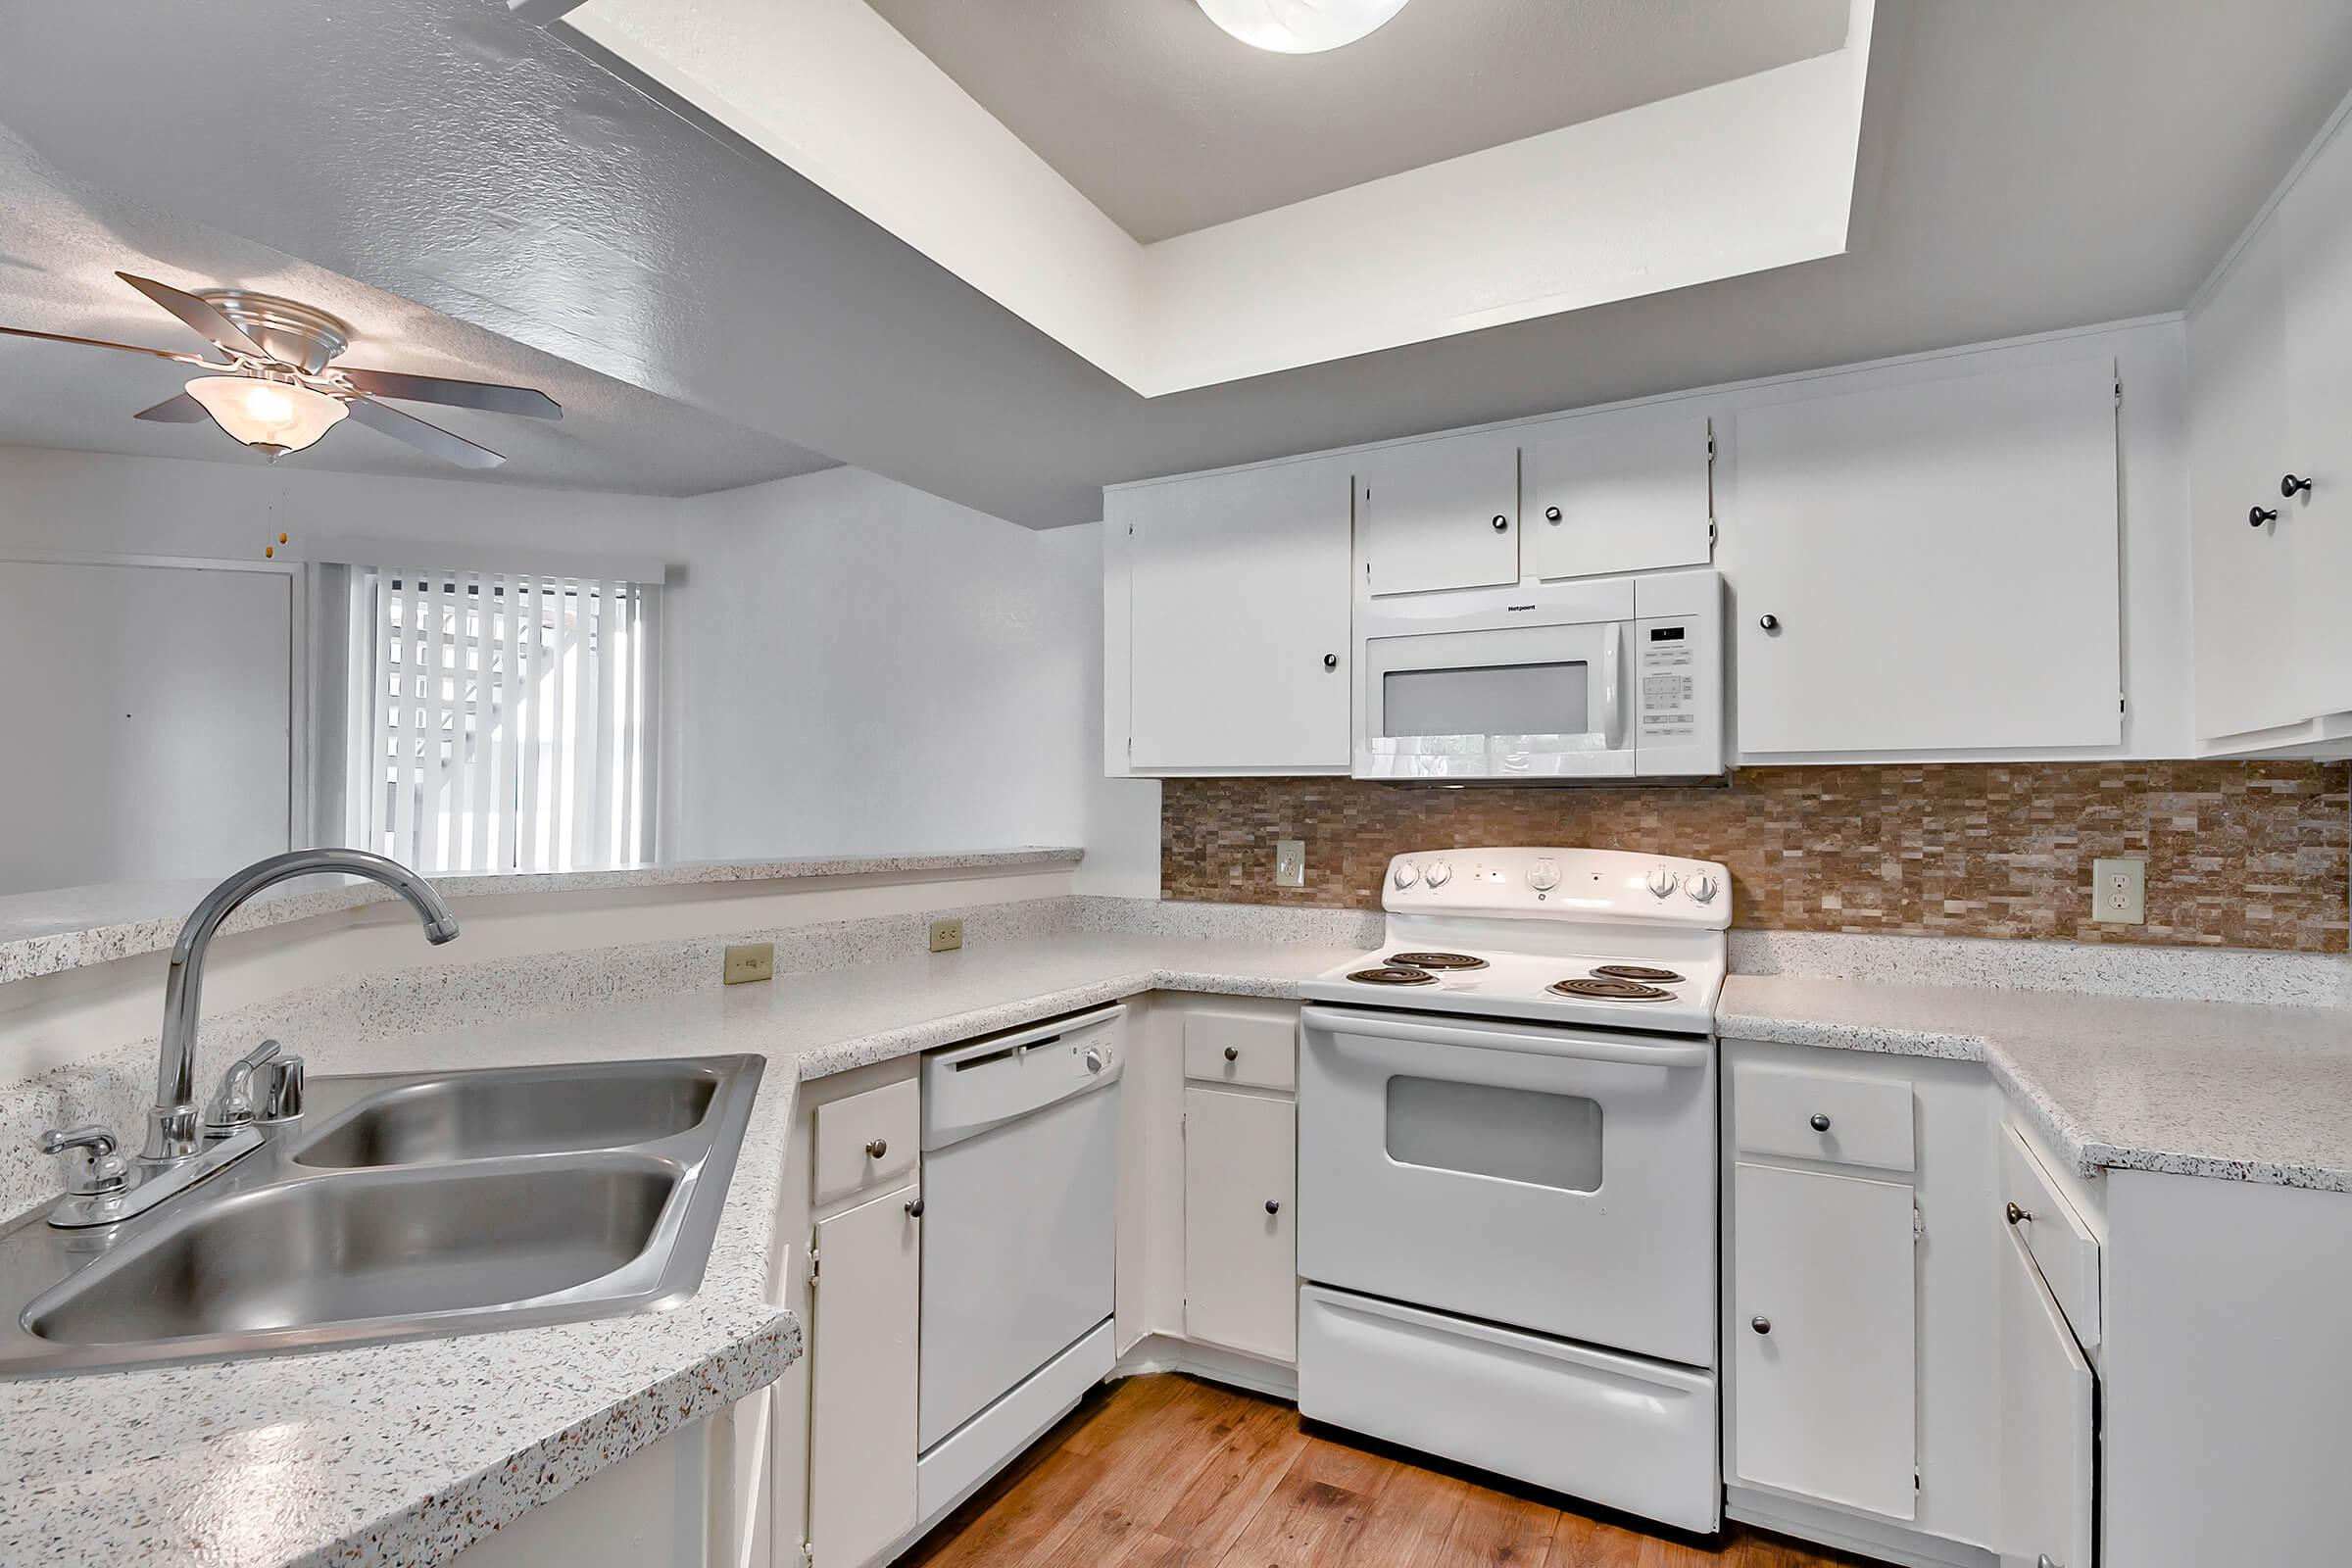 Kitchen_575-W-19Th-St-Costa-Mesa-CA_Park-Center-Place_RPI_II-280960-49.jpg